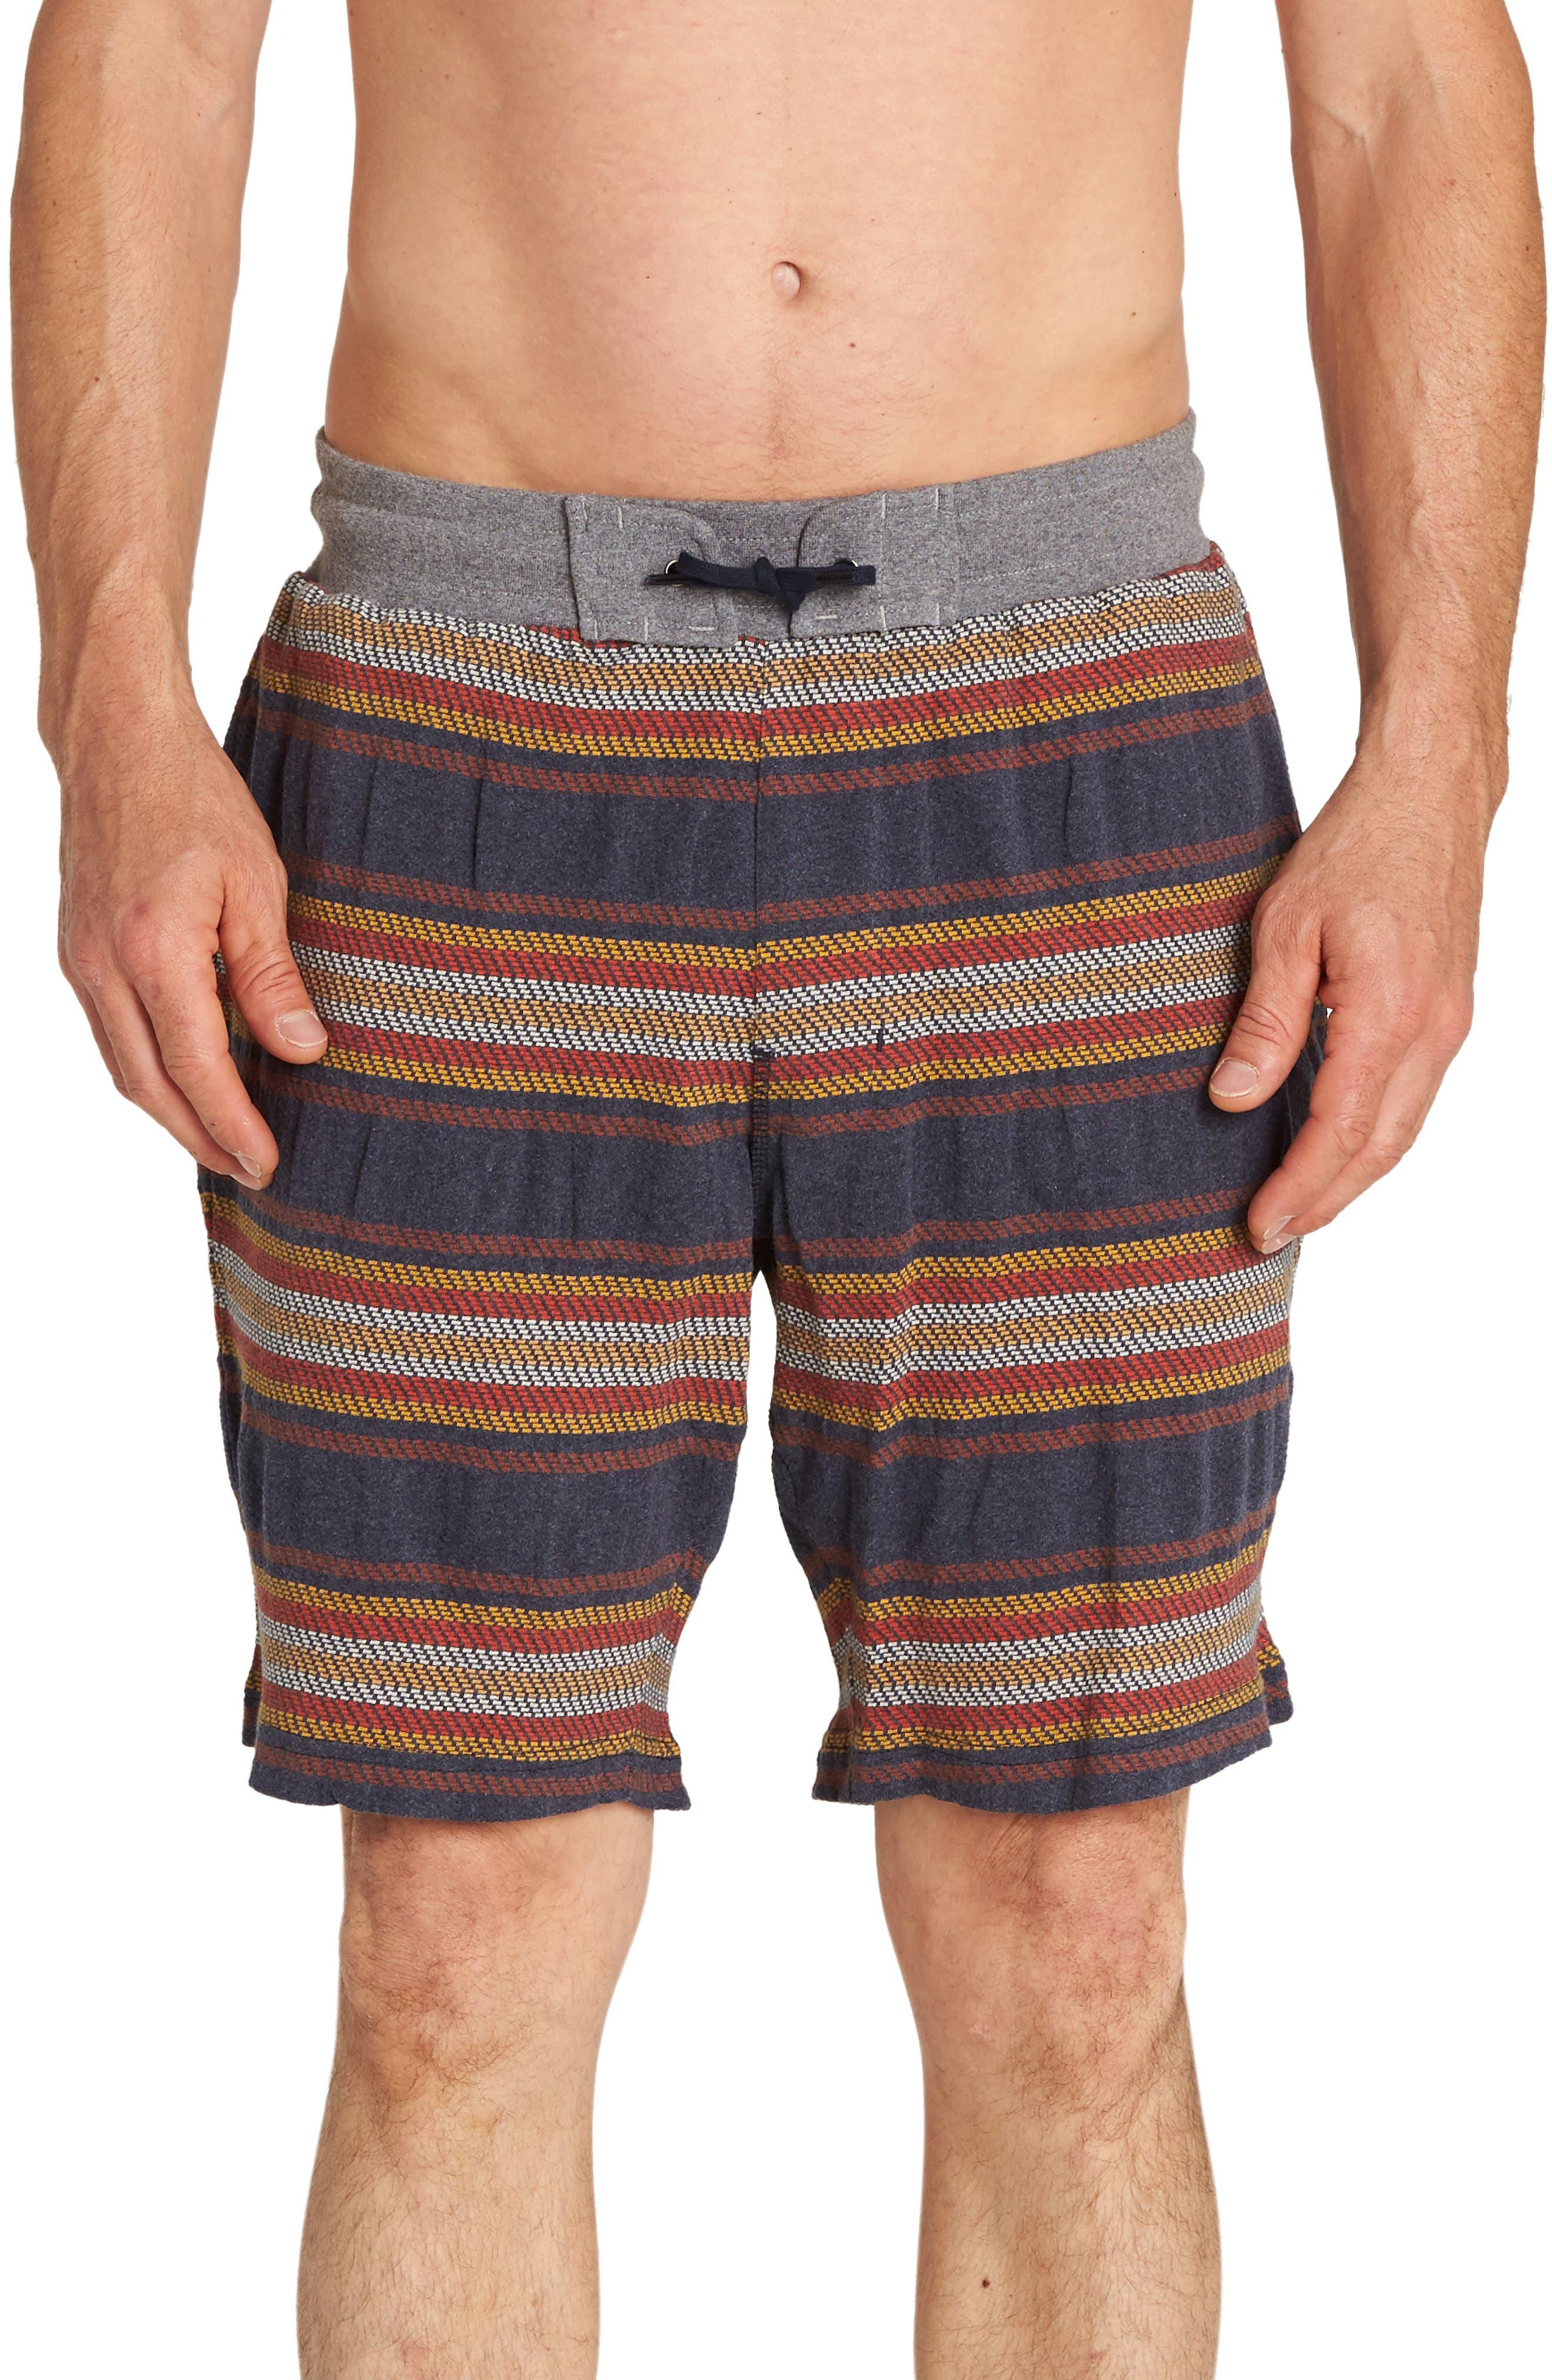 Flecker Baja Shorts,                             Main thumbnail 1, color,                             NAVY HEATHER